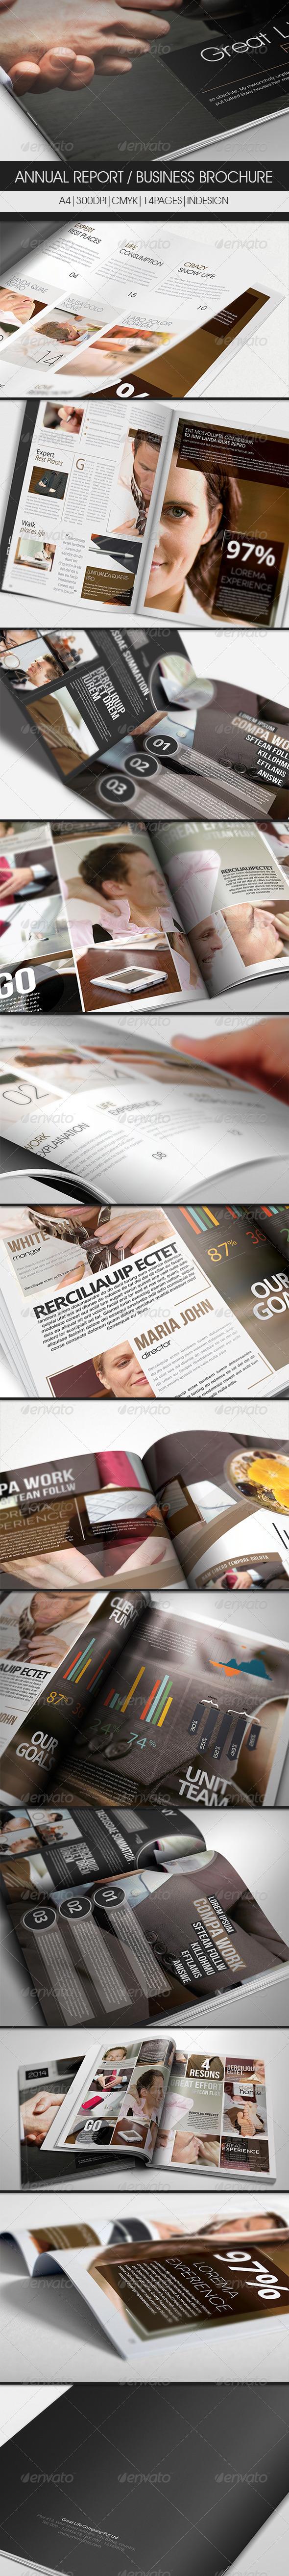 GraphicRiver Annual Report Business Brochure 2979251